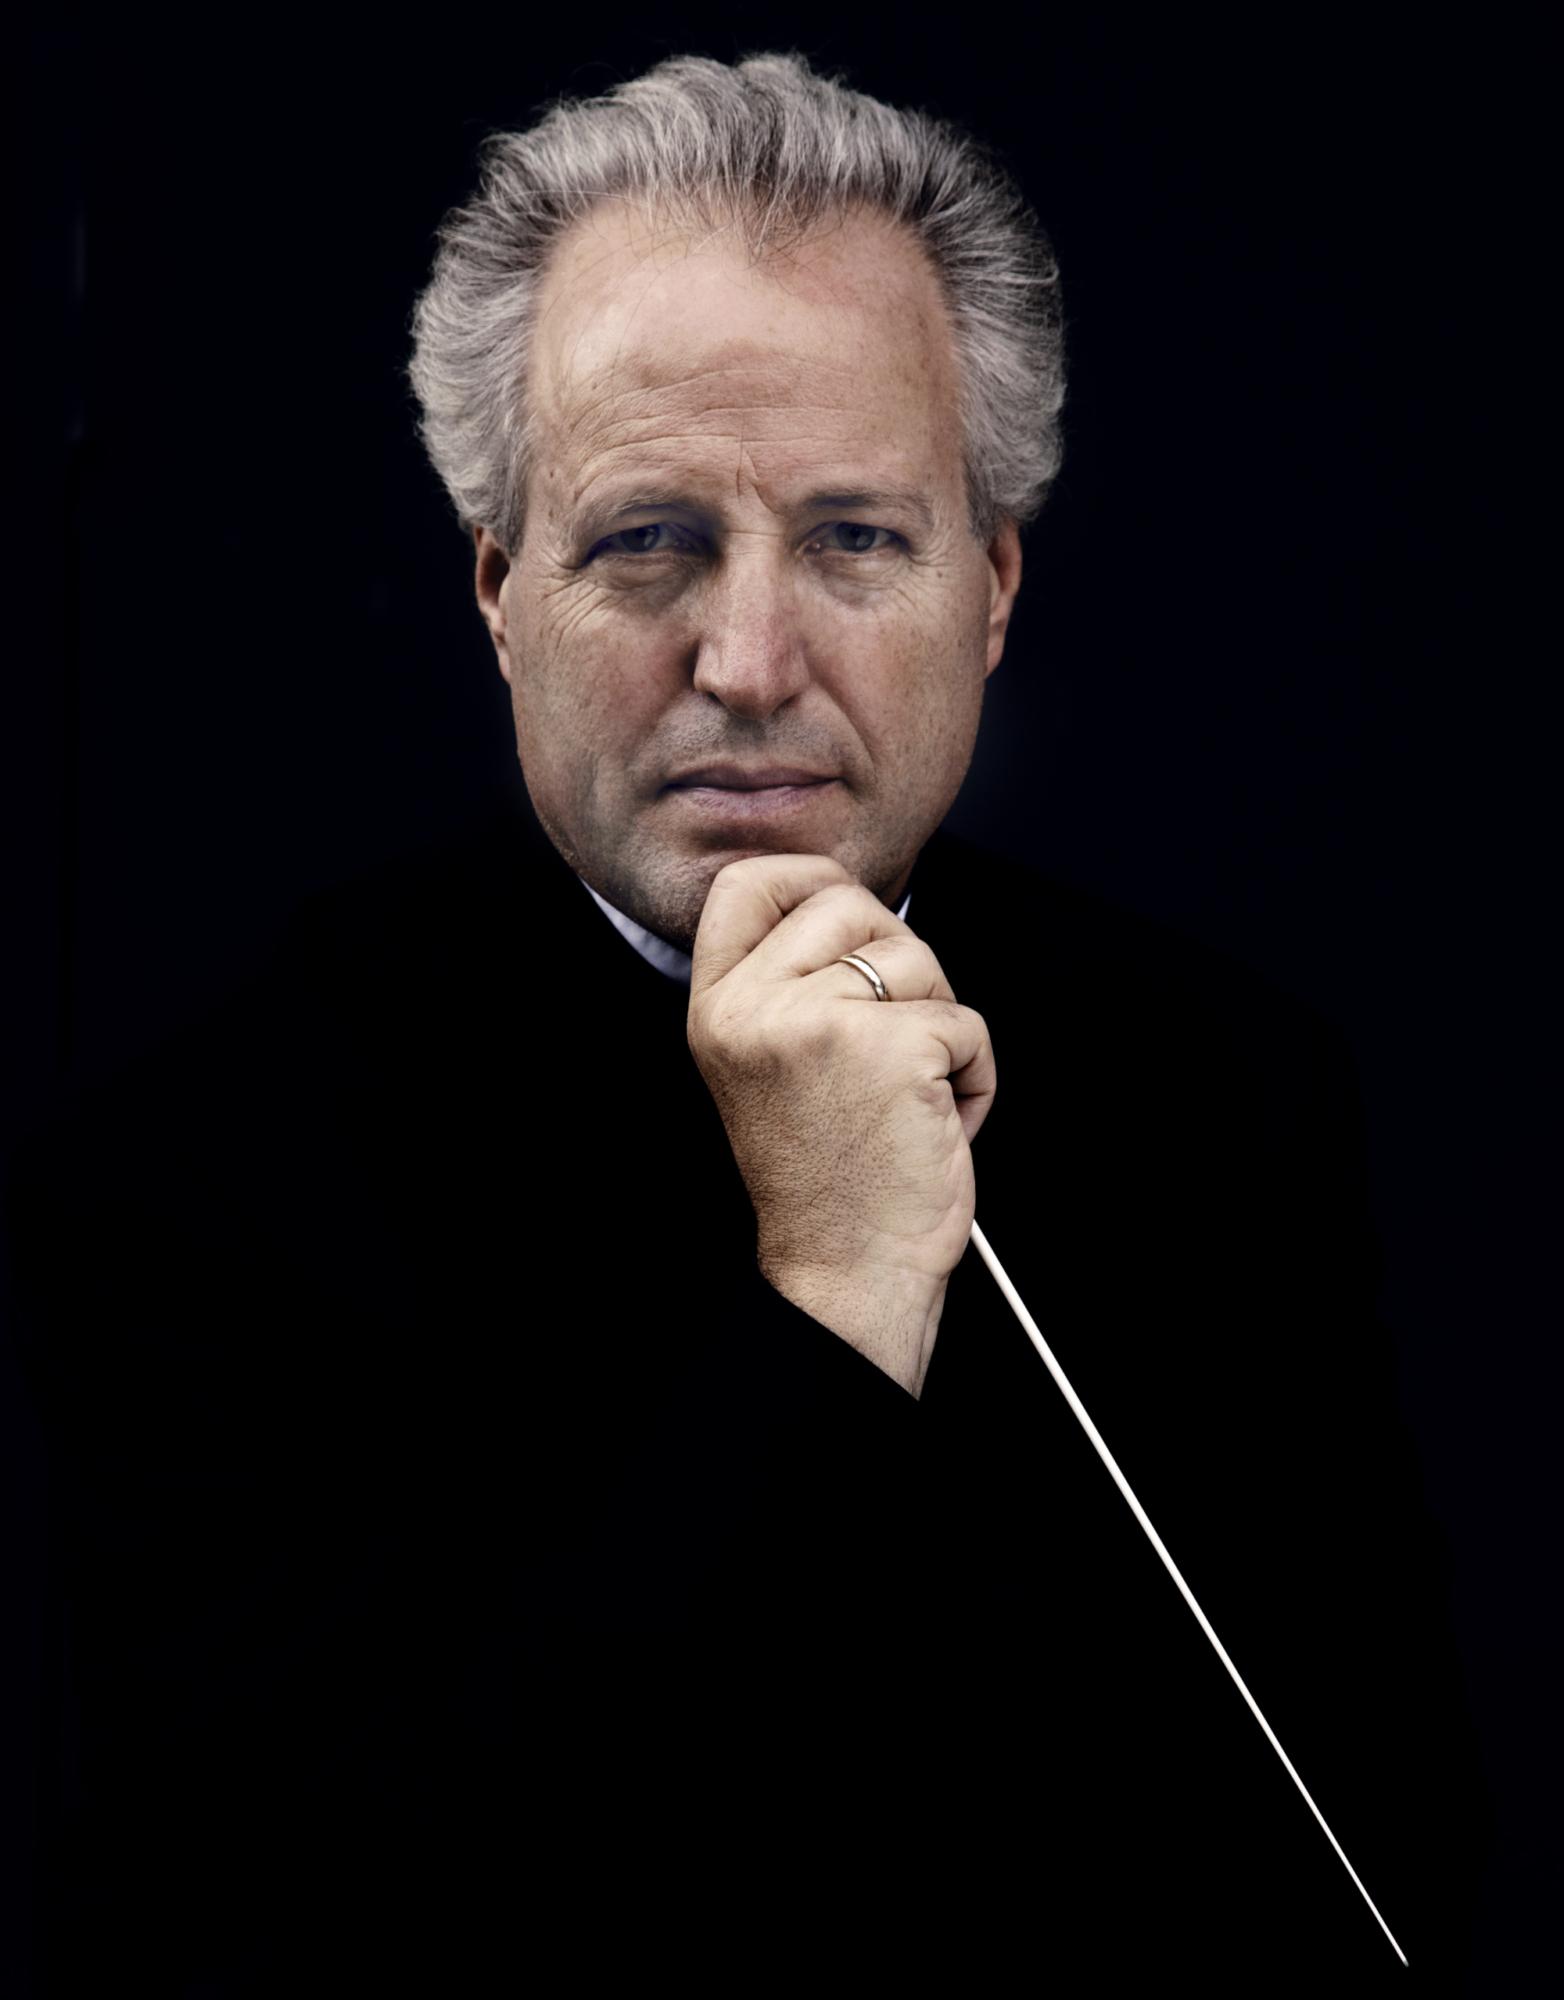 Manfred Honeck Portrait 1